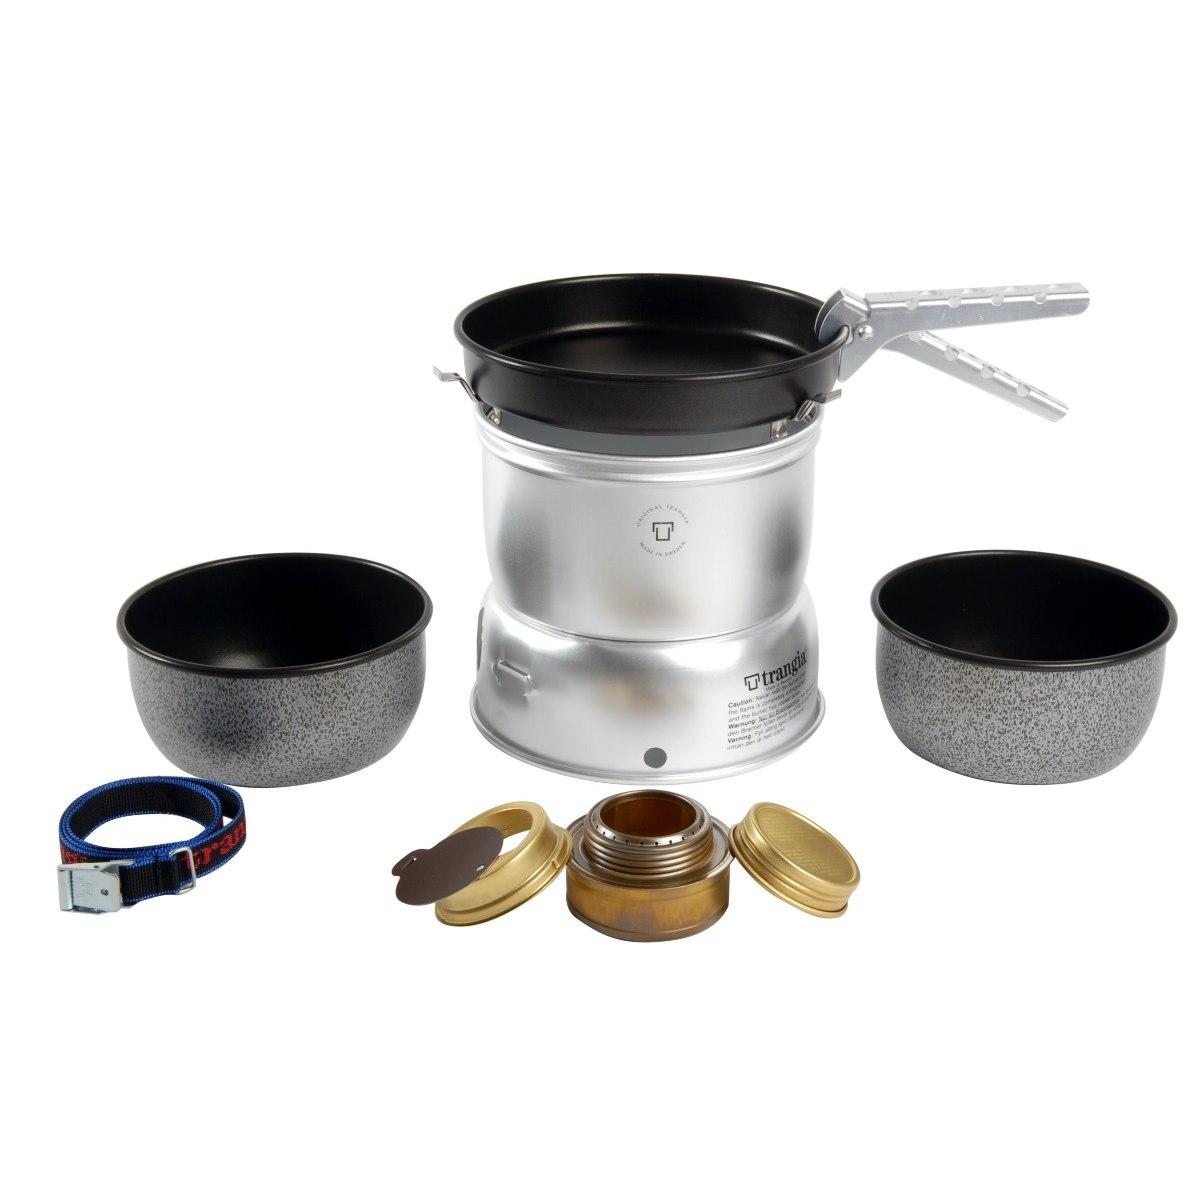 Trangia Storm Cooker 27-5 UL - Stove System, Non-Stick